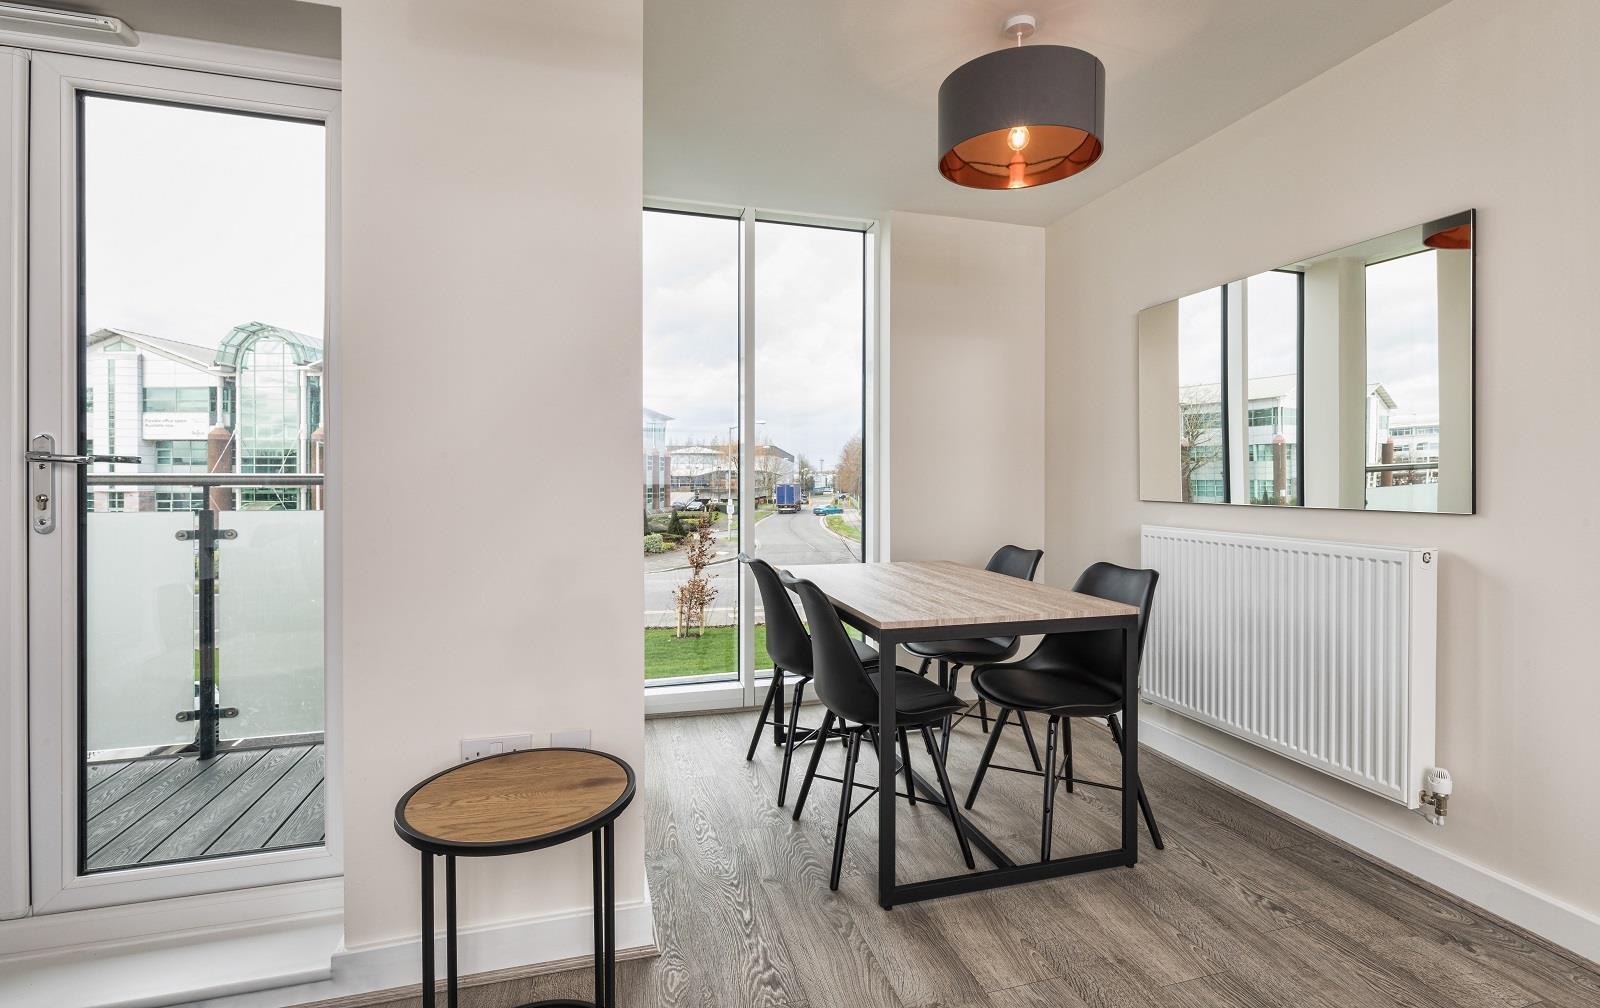 Ruston Close (The Hepburn) - 2 bed apartment, Reading Gateway, Reading RG2 0TD